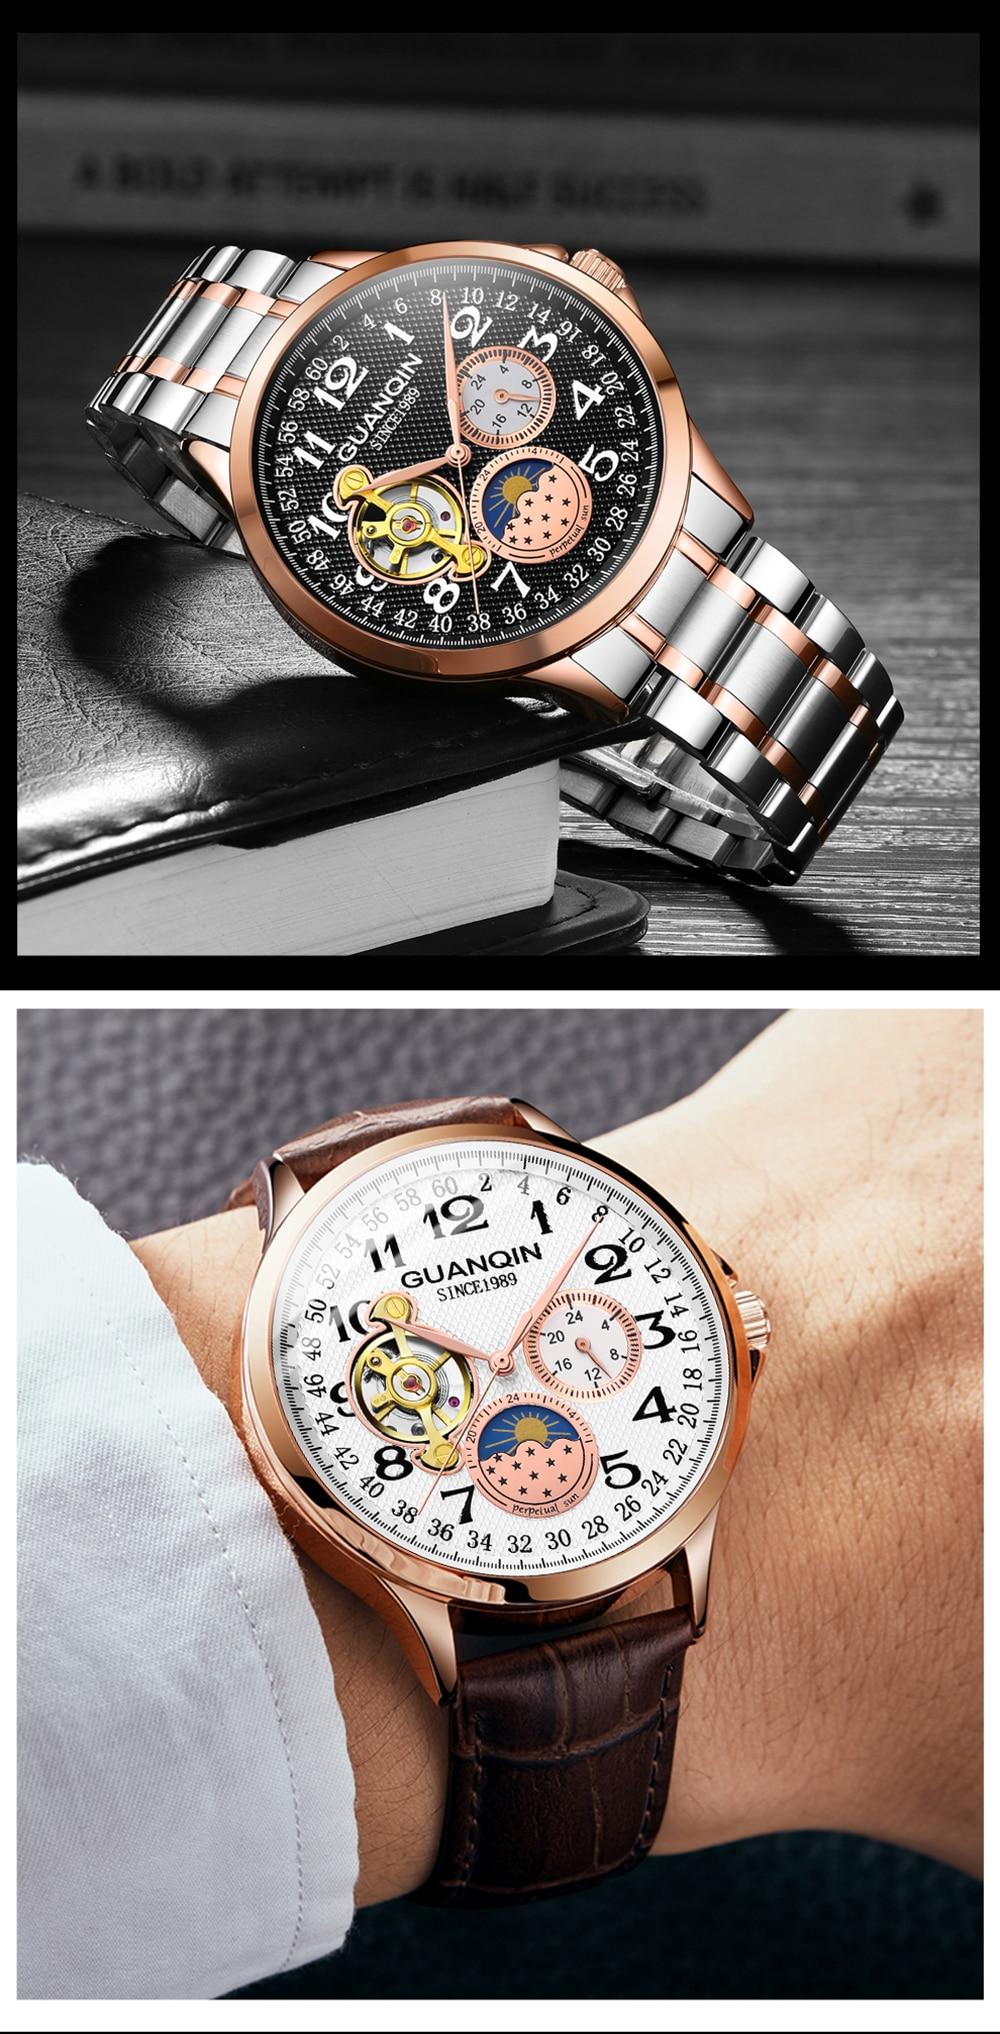 HTB1KHitak9E3KVjSZFrq6y0UVXam 2019 Fashion GUANQIN Mens Watches Top Brand Luxury Skeleton Watch Men Sport Leather Tourbillon Automatic Mechanical Wristwatch